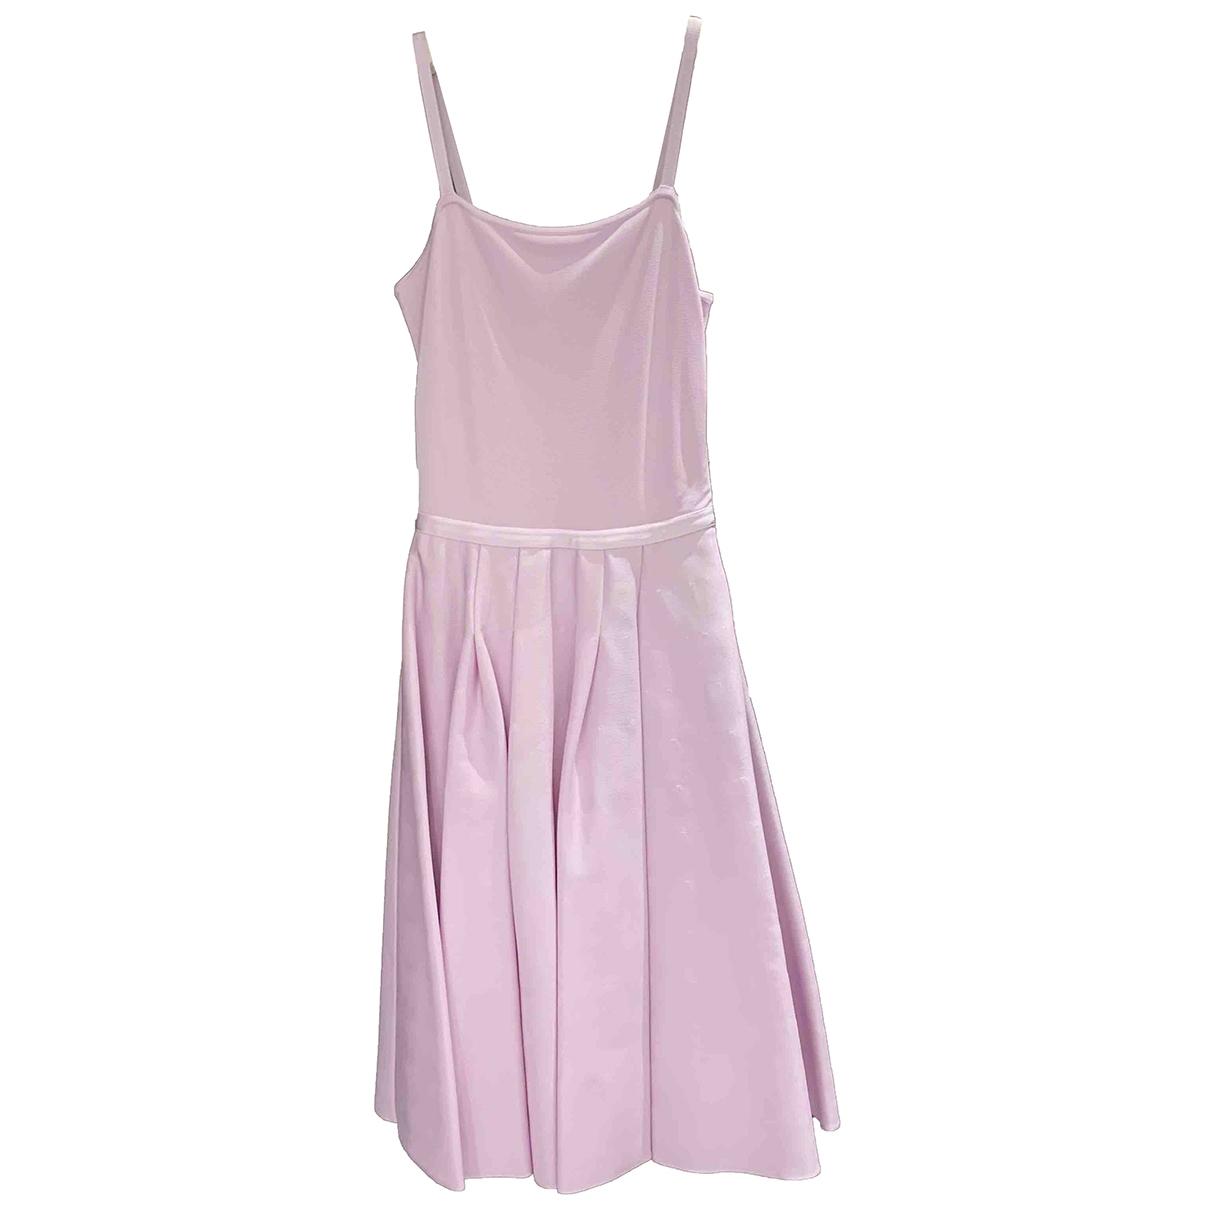 Dior \N Pink dress for Women 10 UK